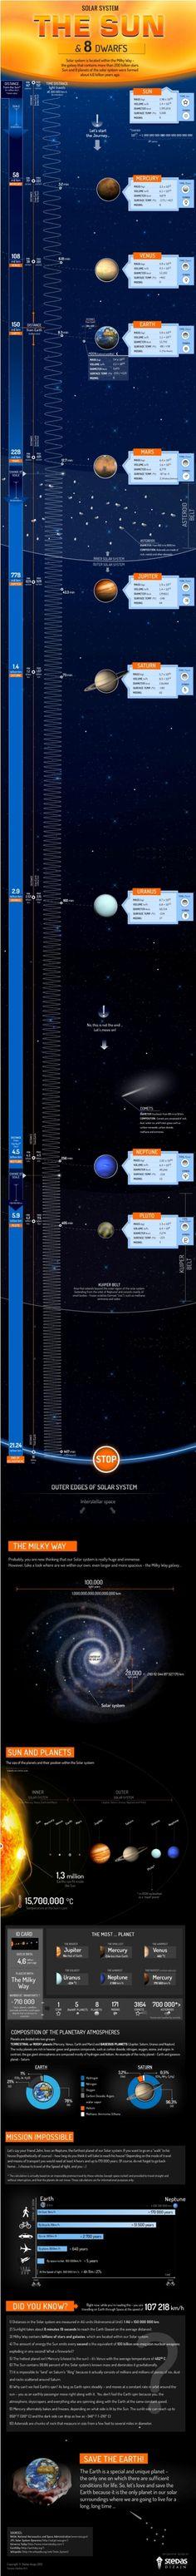 3.-Our-Solar-System.jpg 420×5,513 pixels